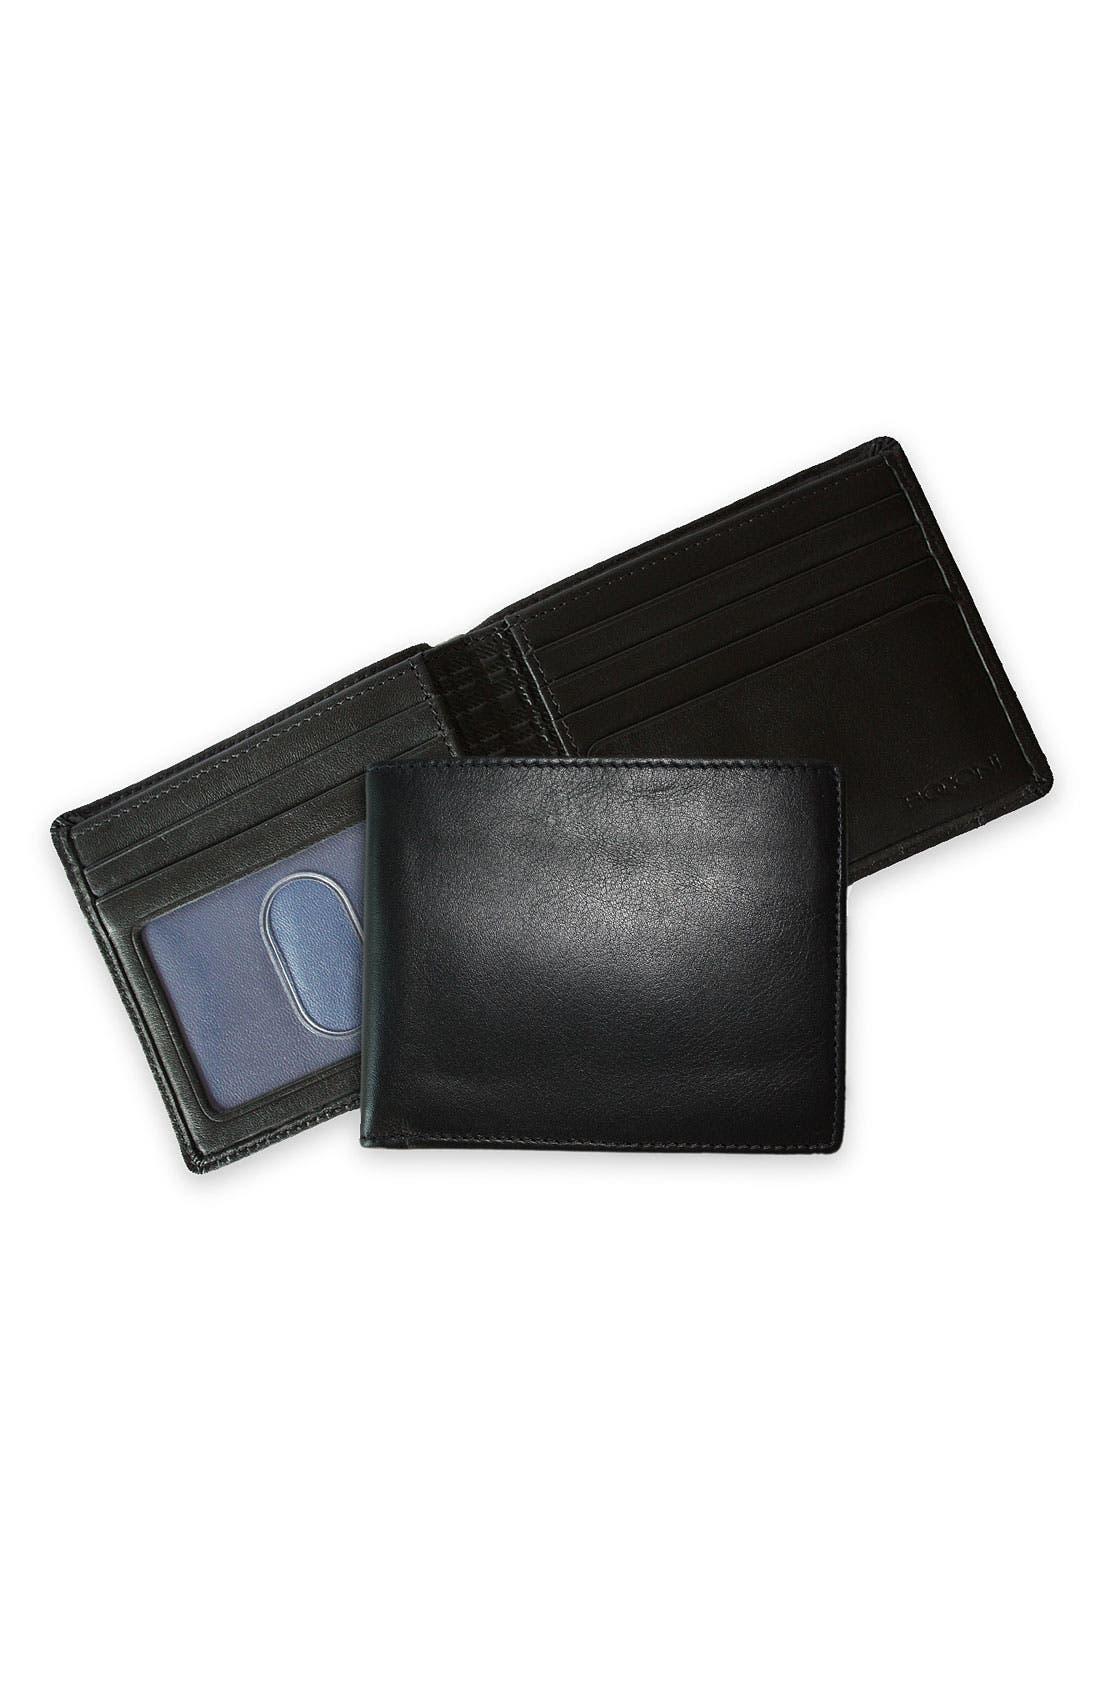 Main Image - Boconi Leather Billfold